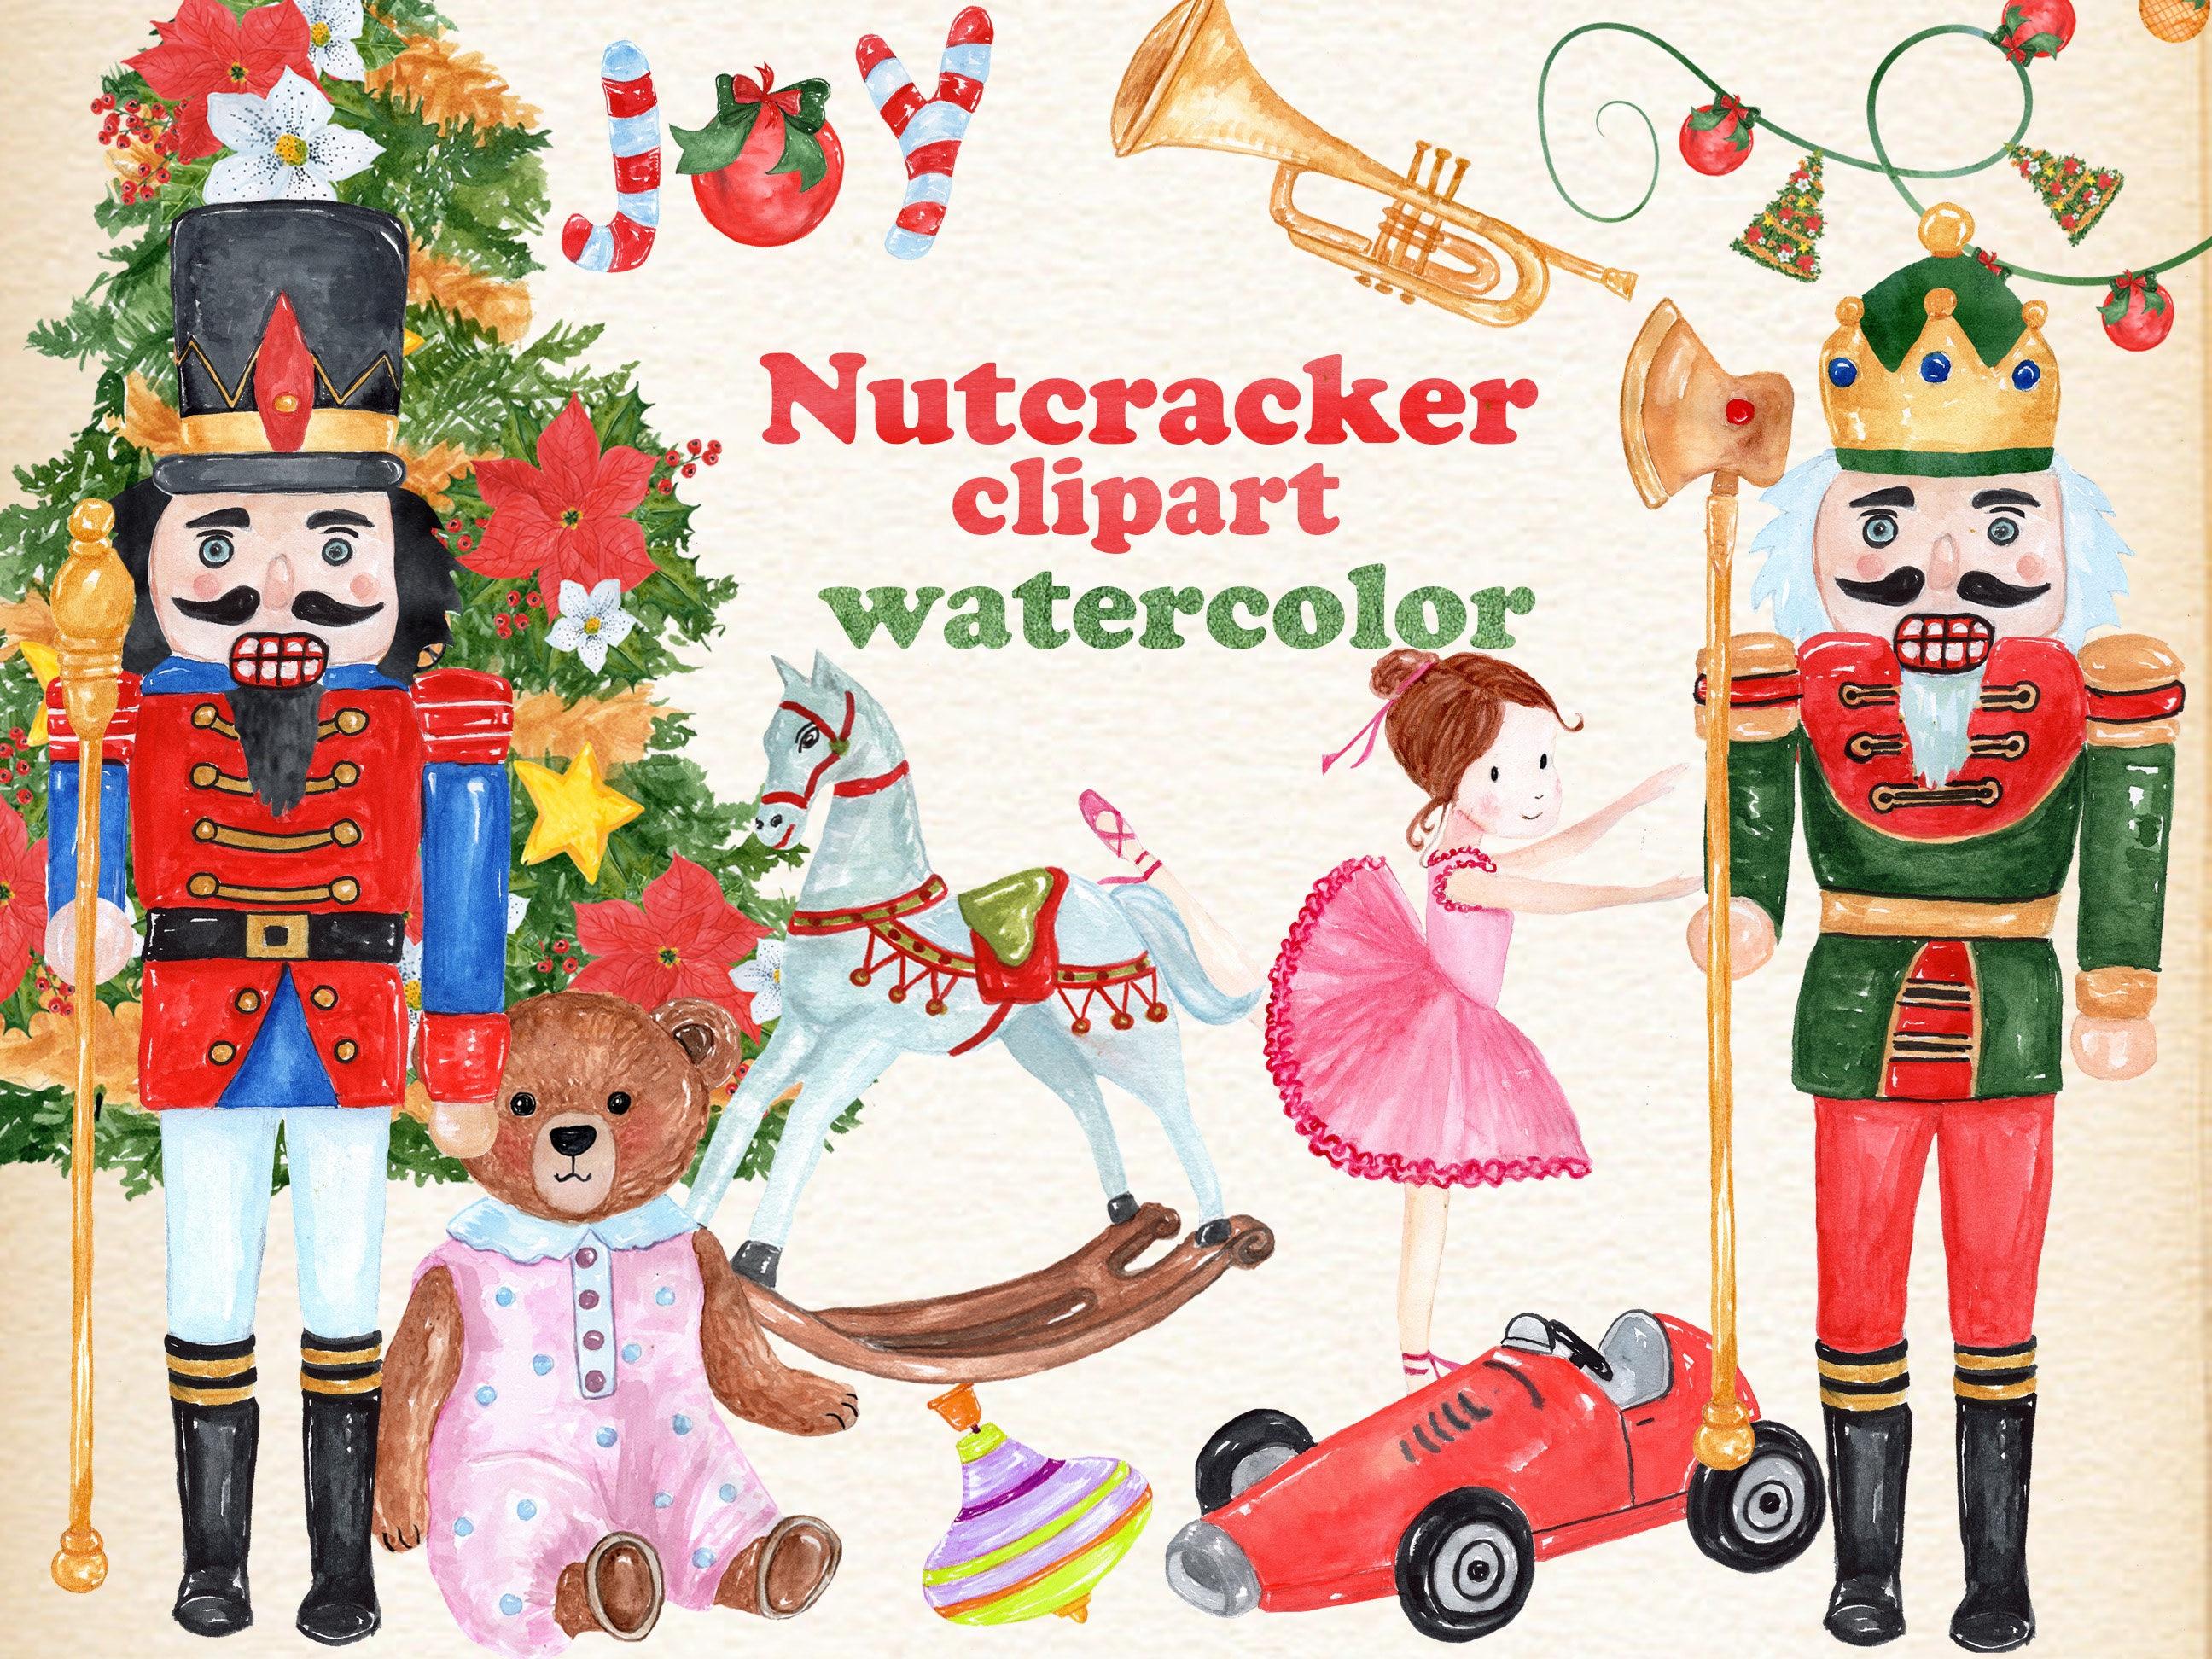 Watercolor Christmas clipart: NUTCRACKER CLIPART | Etsy